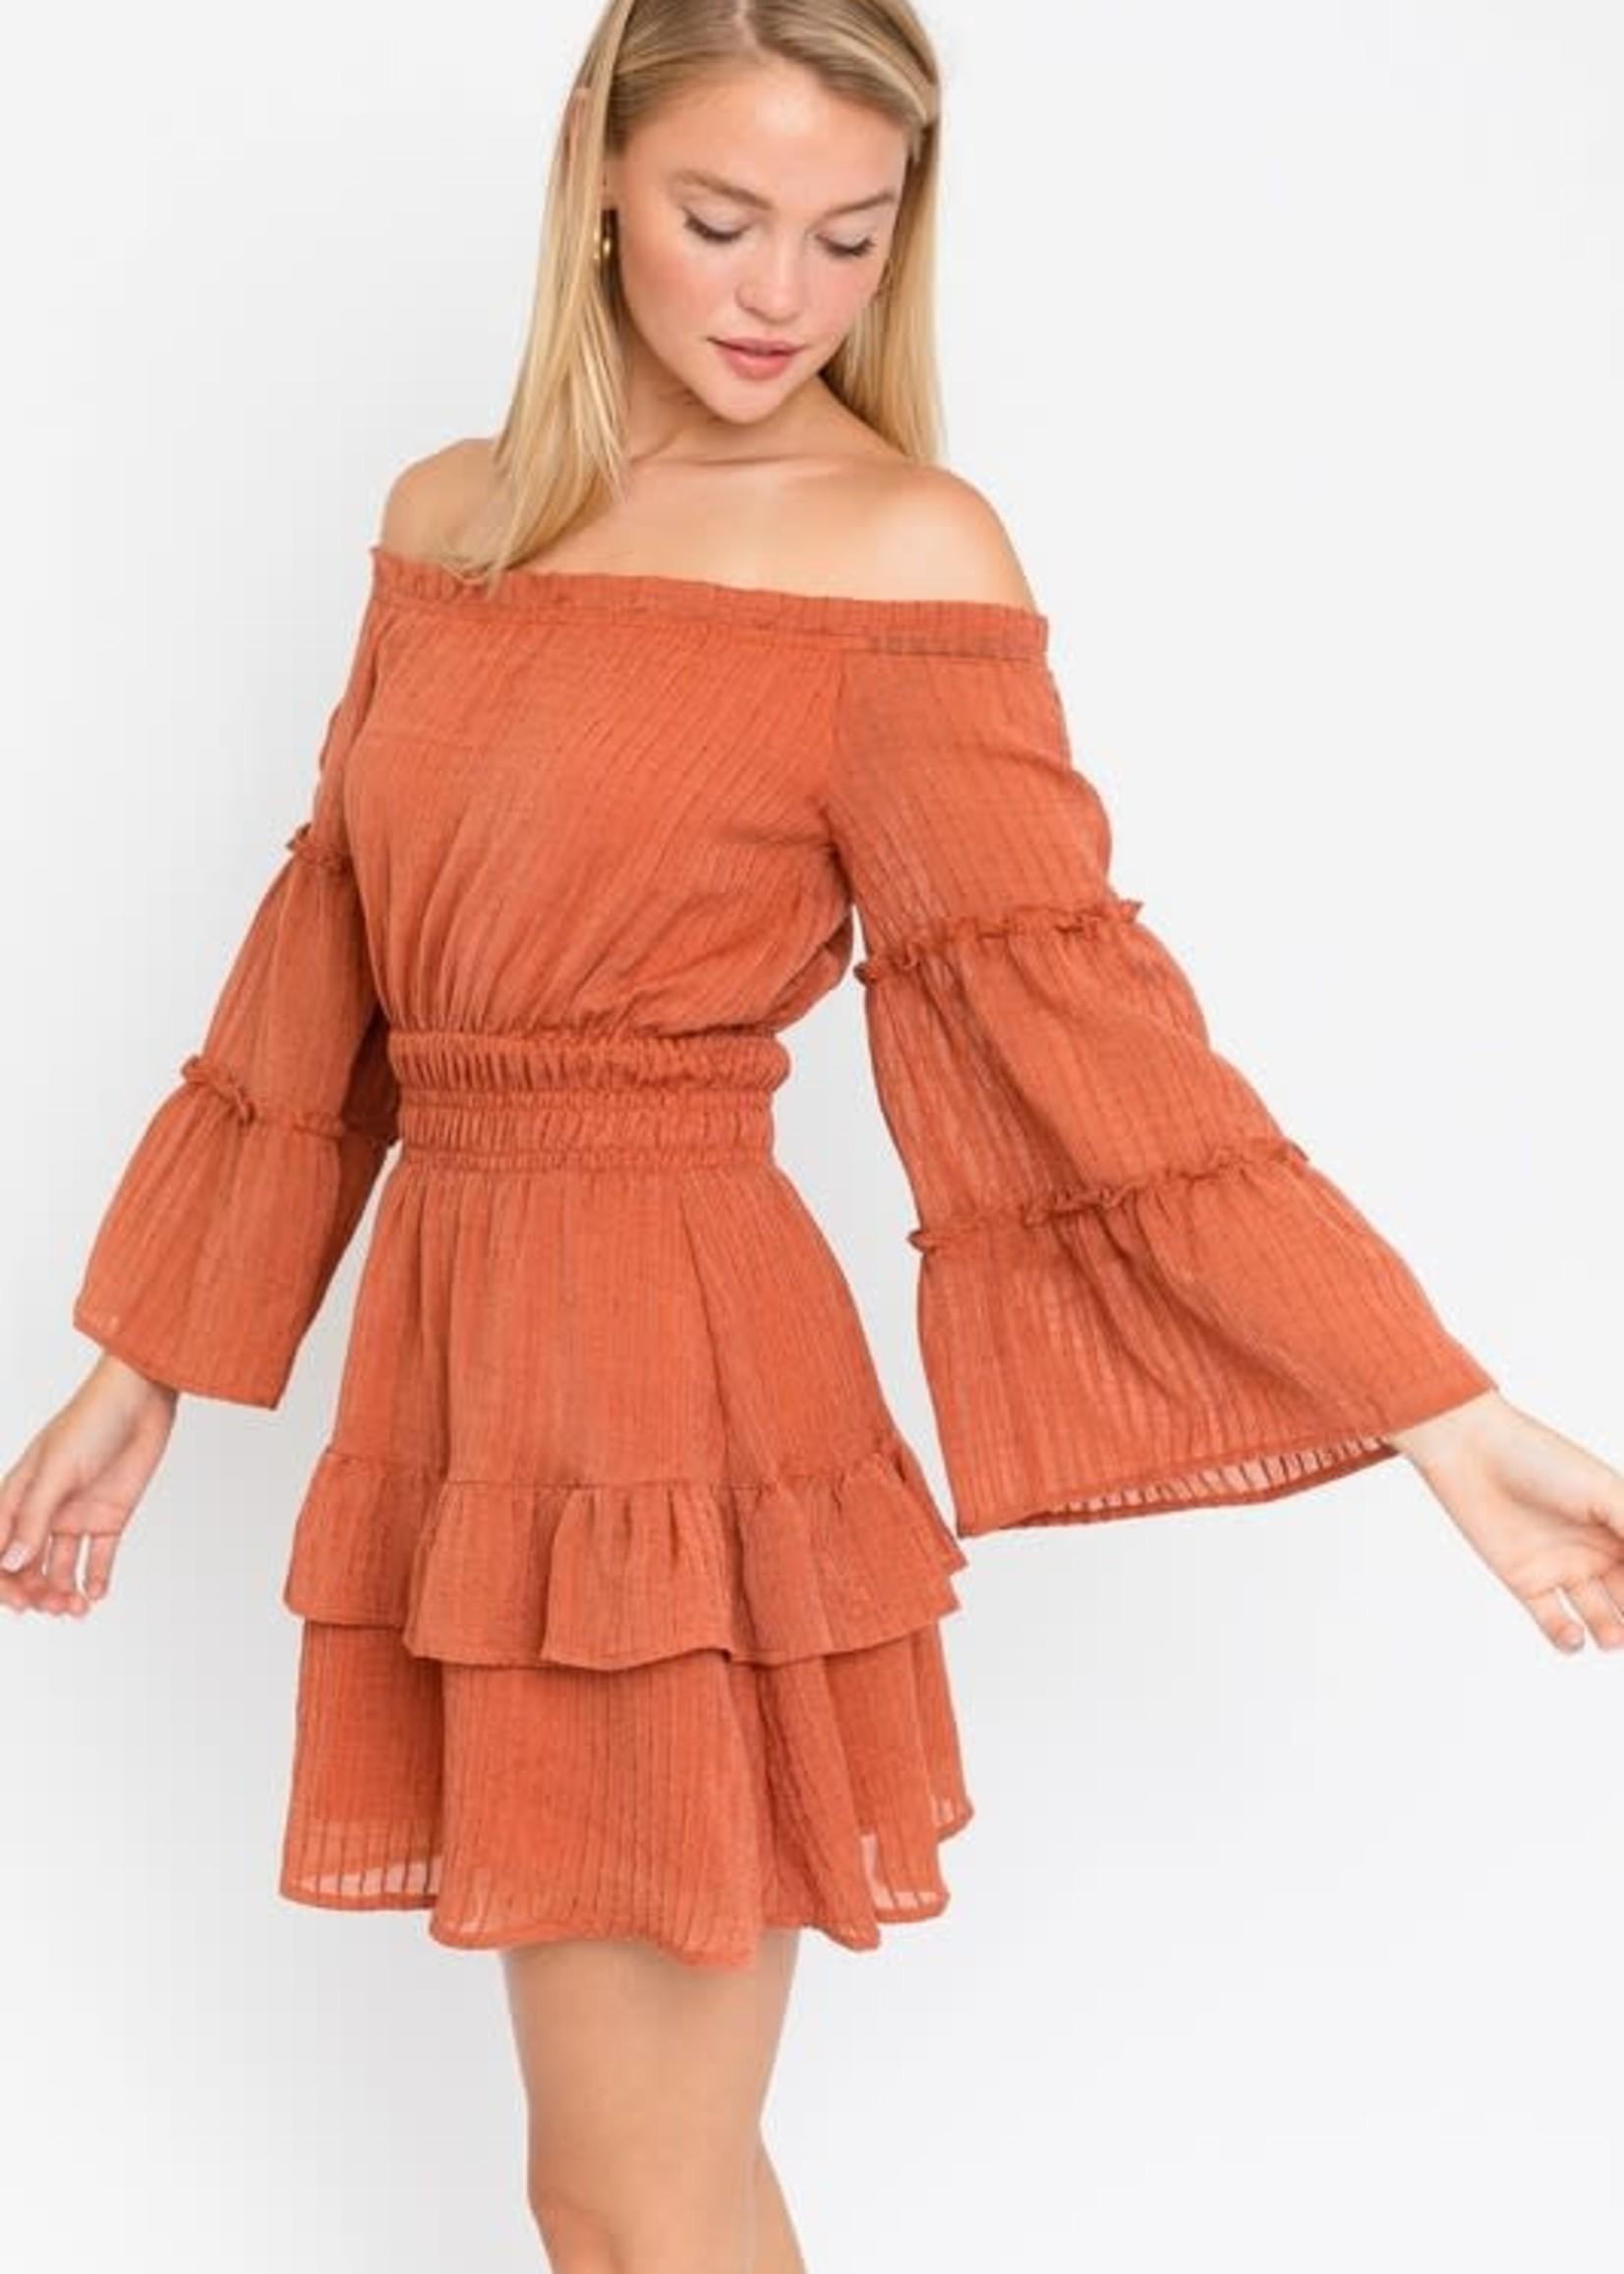 Best Of Fall Rust Dress